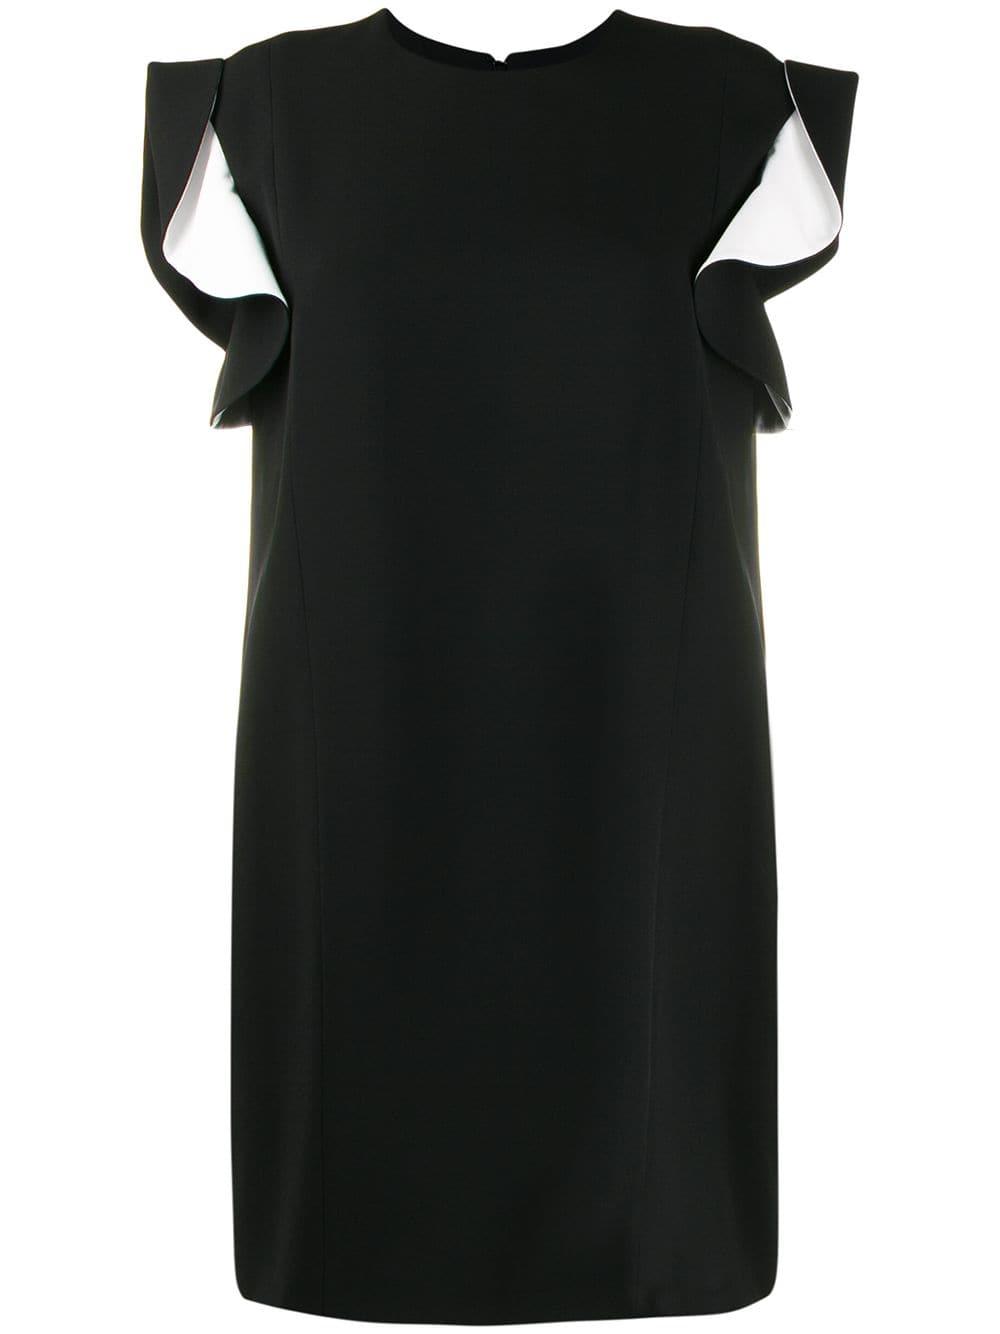 black and white sleeveless ruffle dress GIVENCHY      BW20KV10F4004